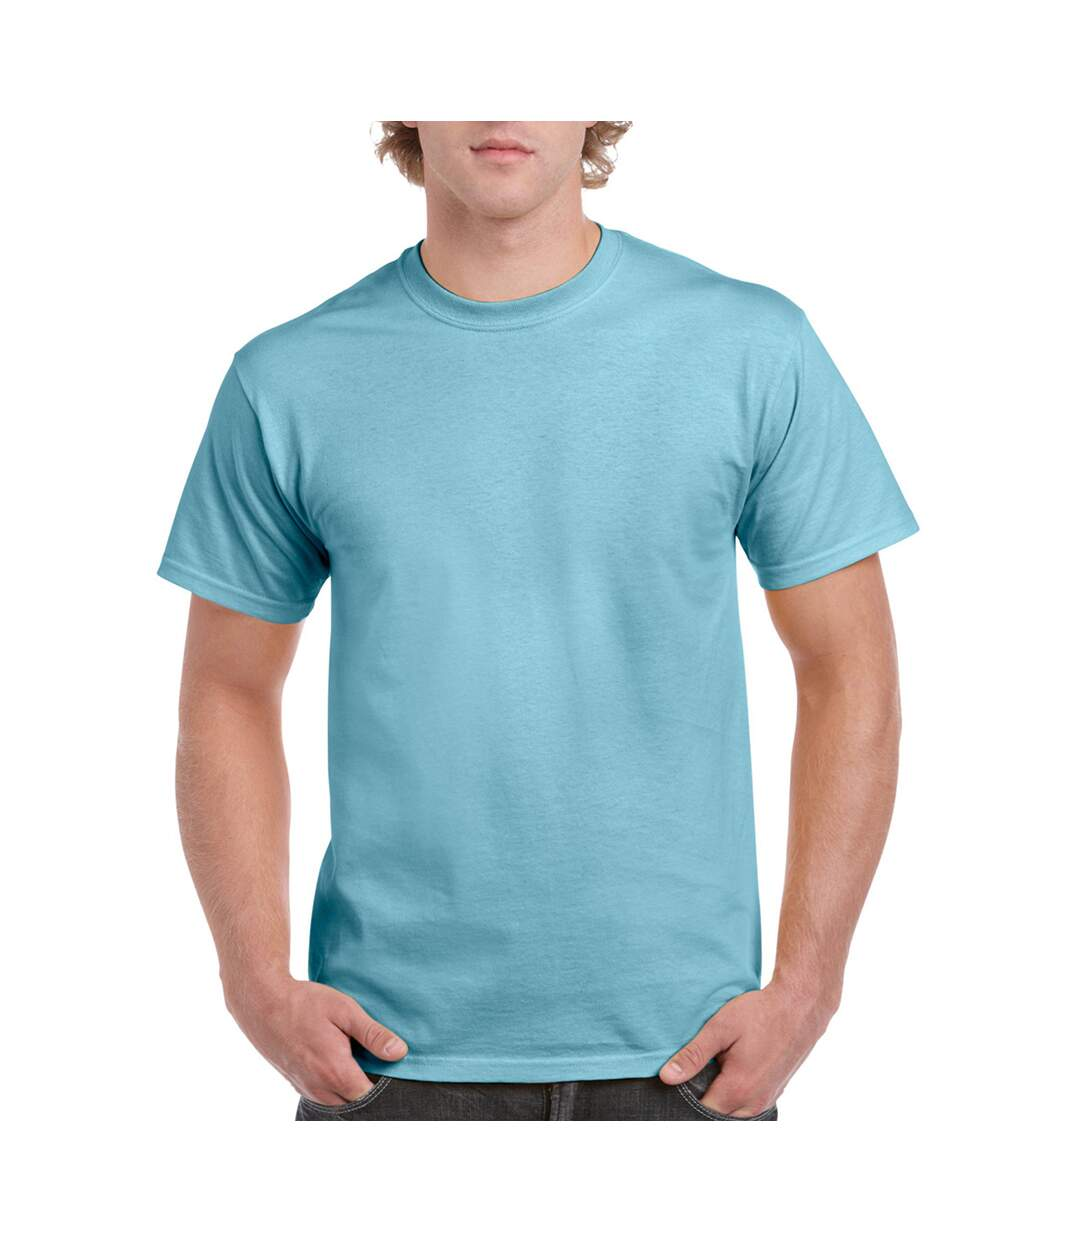 Gildan Mens Ultra Cotton Short Sleeve T-Shirt (White) - UTBC475